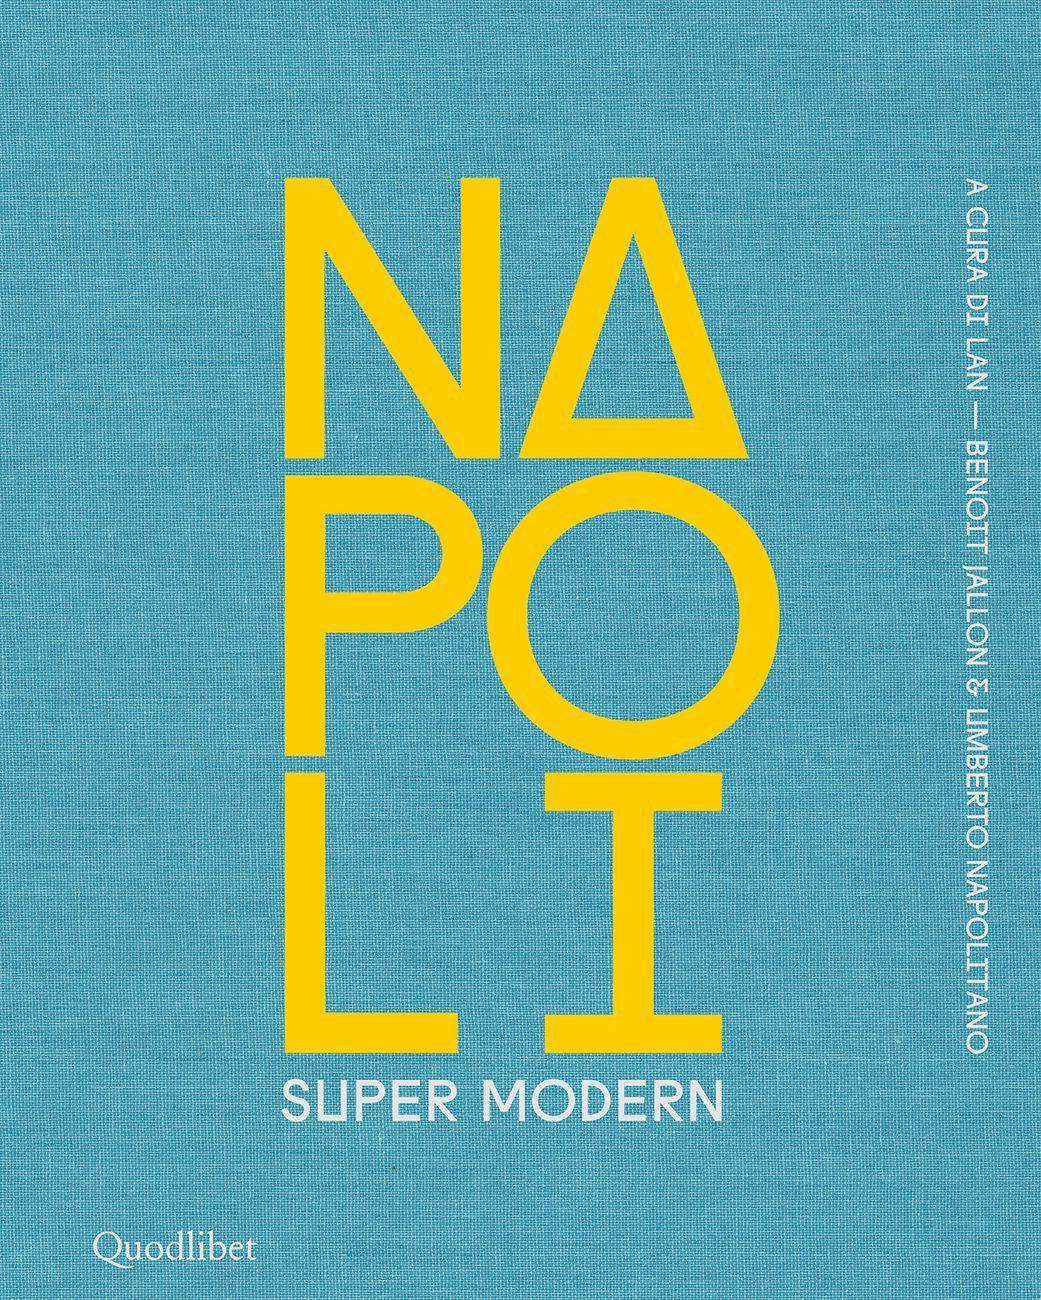 Benoît Jallon & Umberto Napolitano (a cura di), Napoli Super Modern (Quodlibet, Macerata 2020)